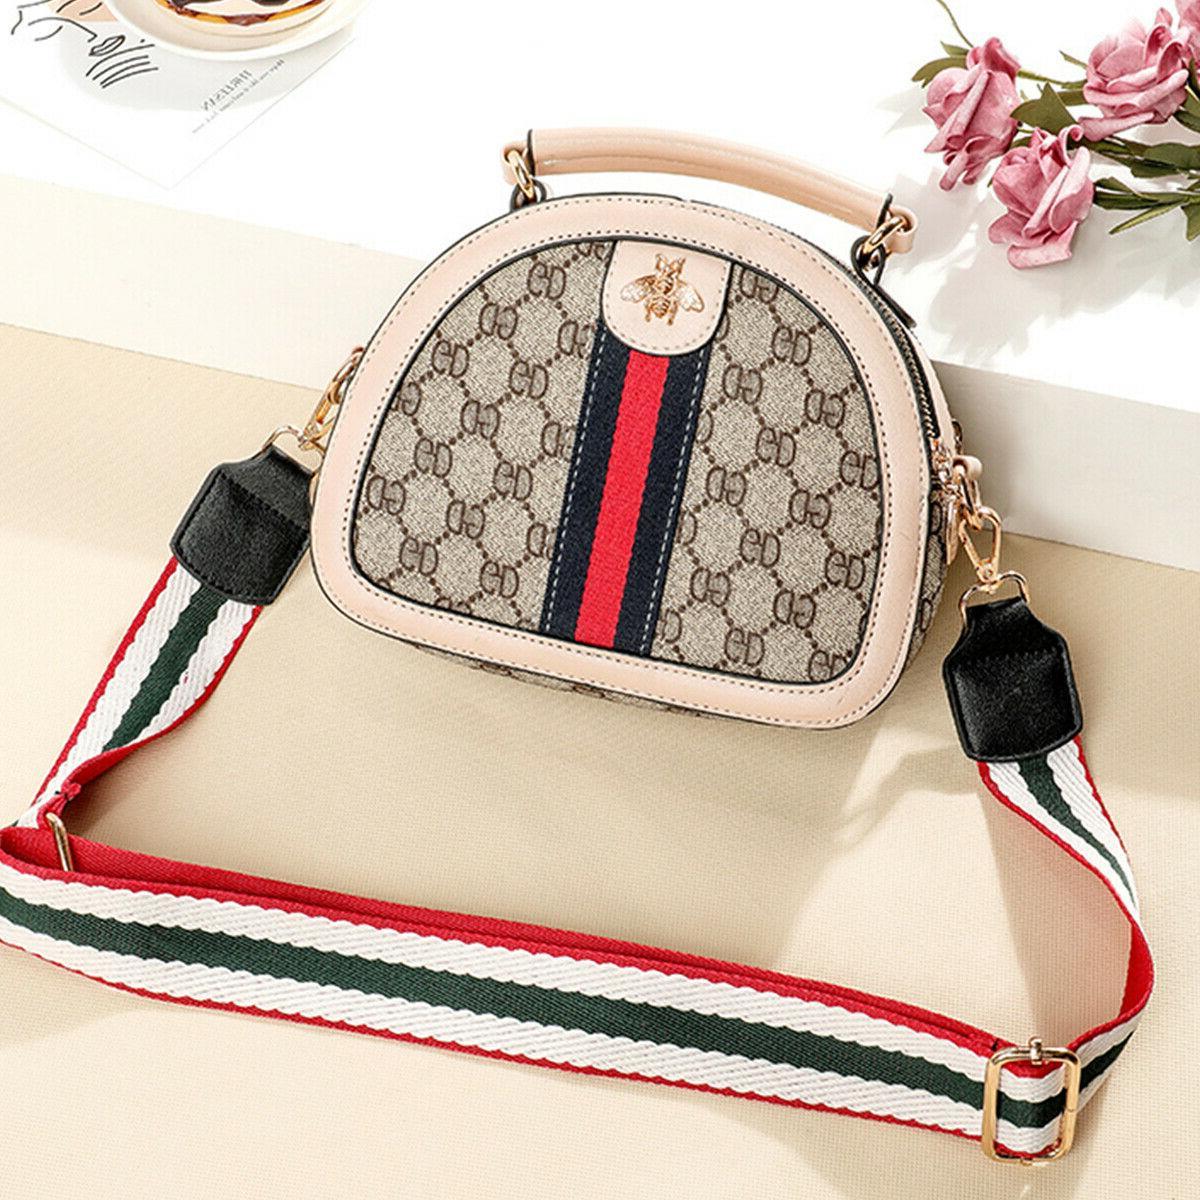 Women Fashion Handbags Small Bags Leather